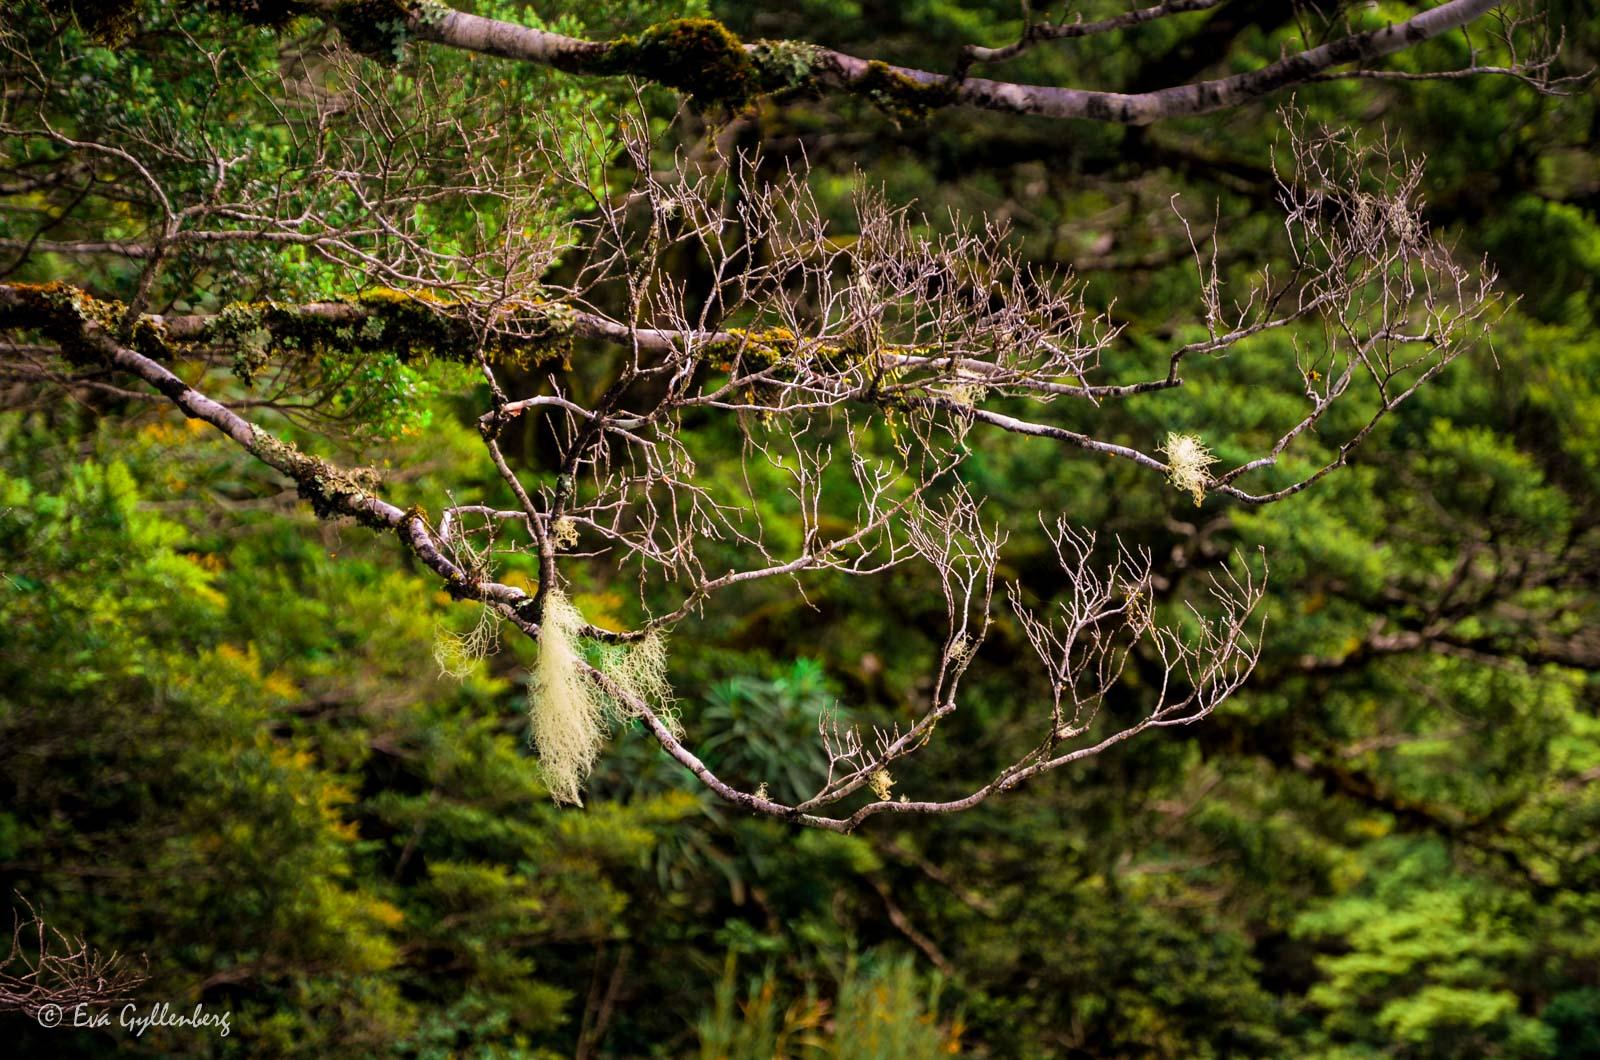 Mossiga grenar i Mount Aspiring